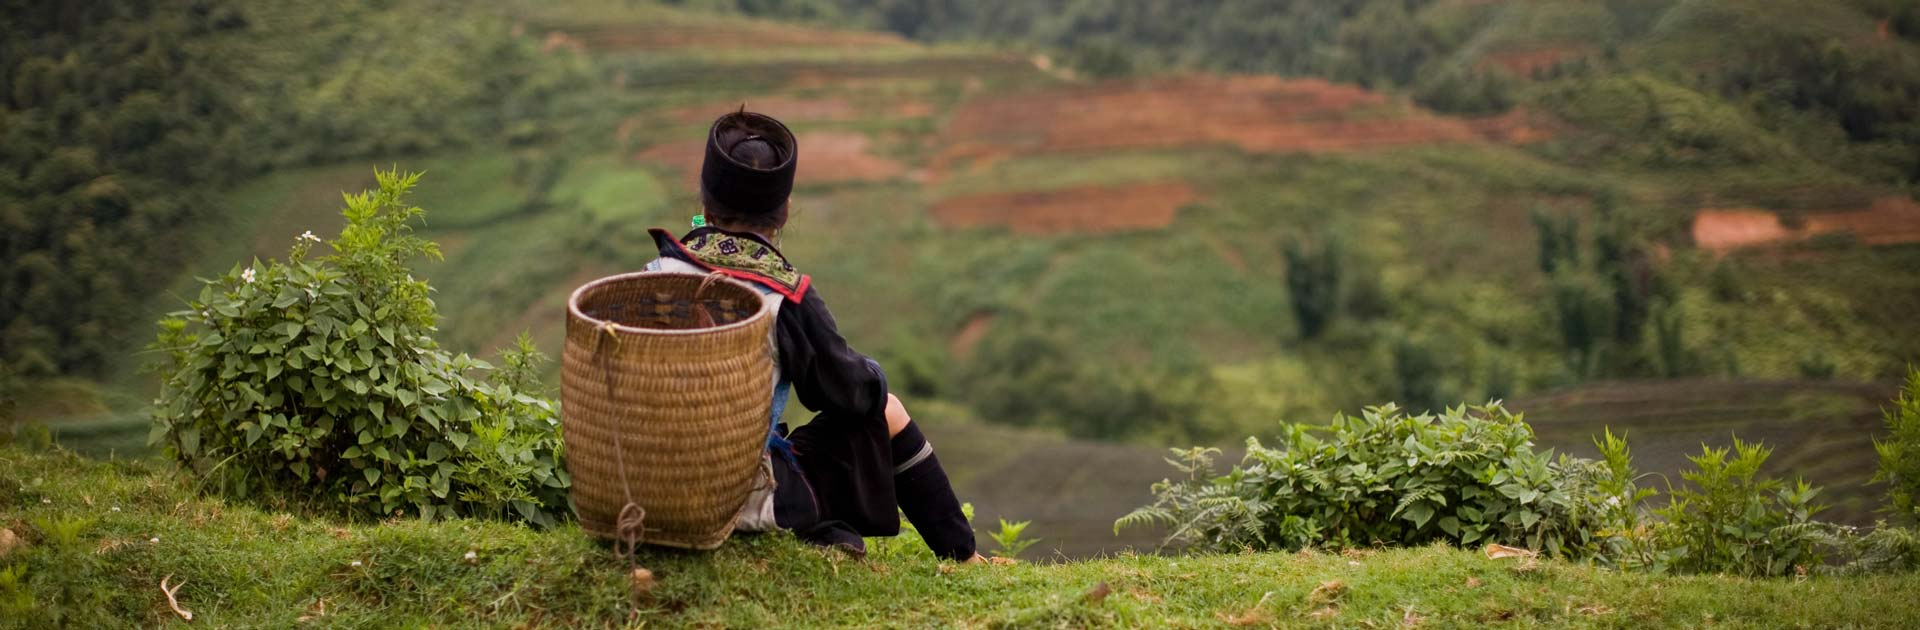 VN Encanto de Vietnam con Sapa